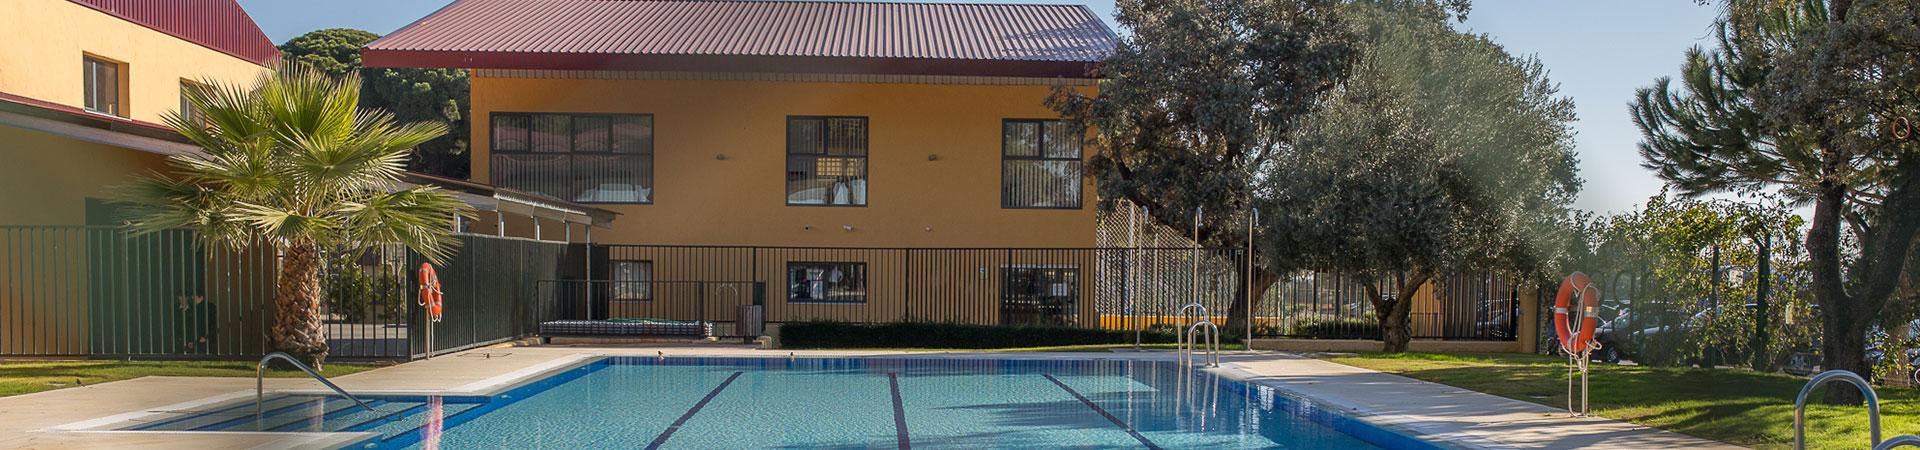 cbs-slider-piscina-instalaciones